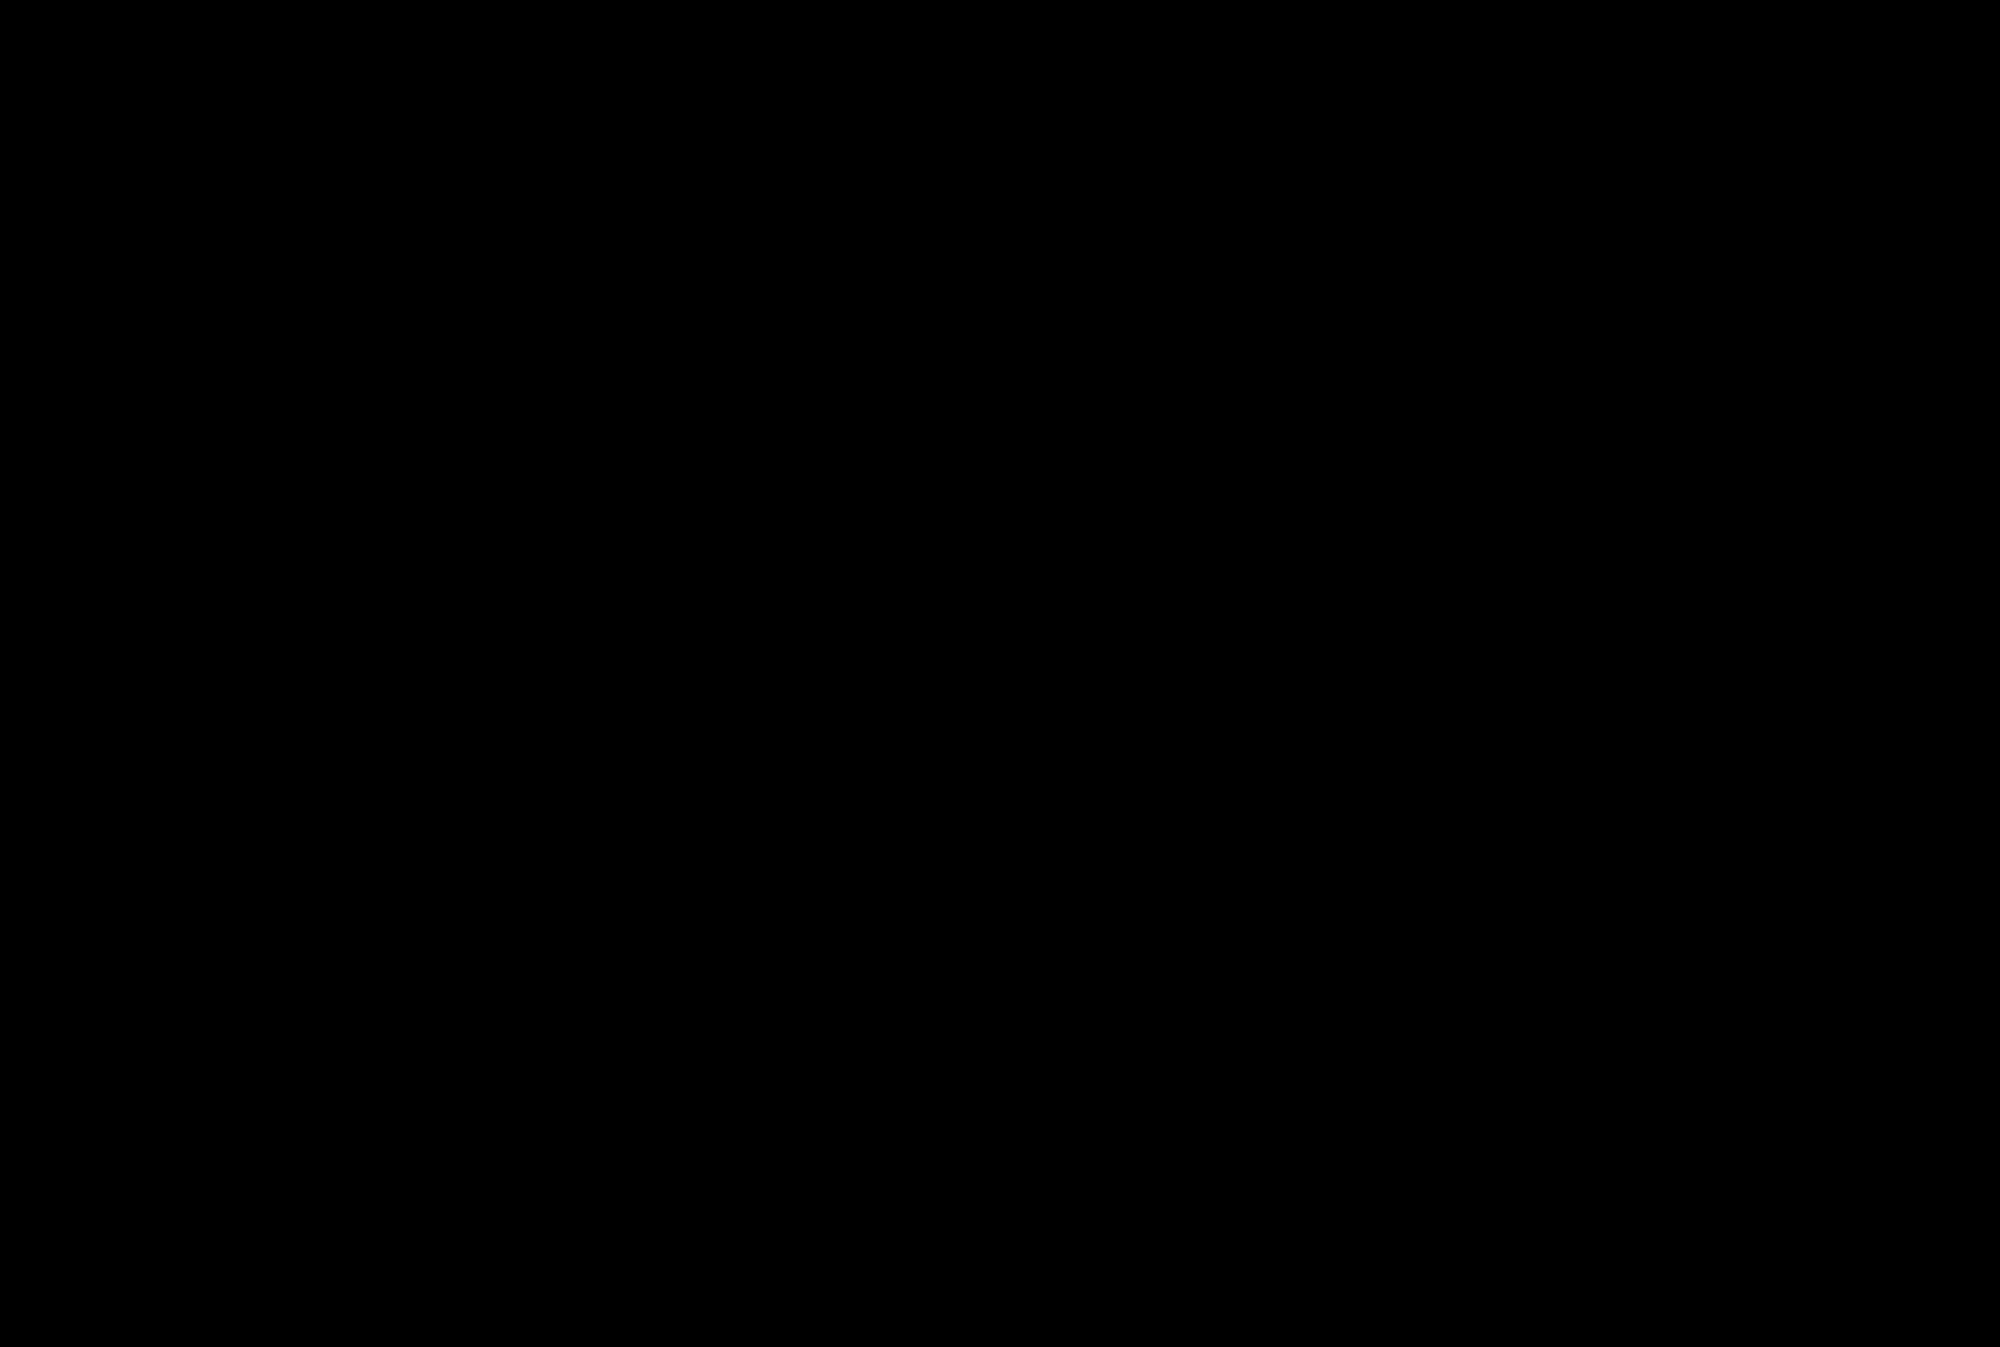 Omnium logo black on white.png